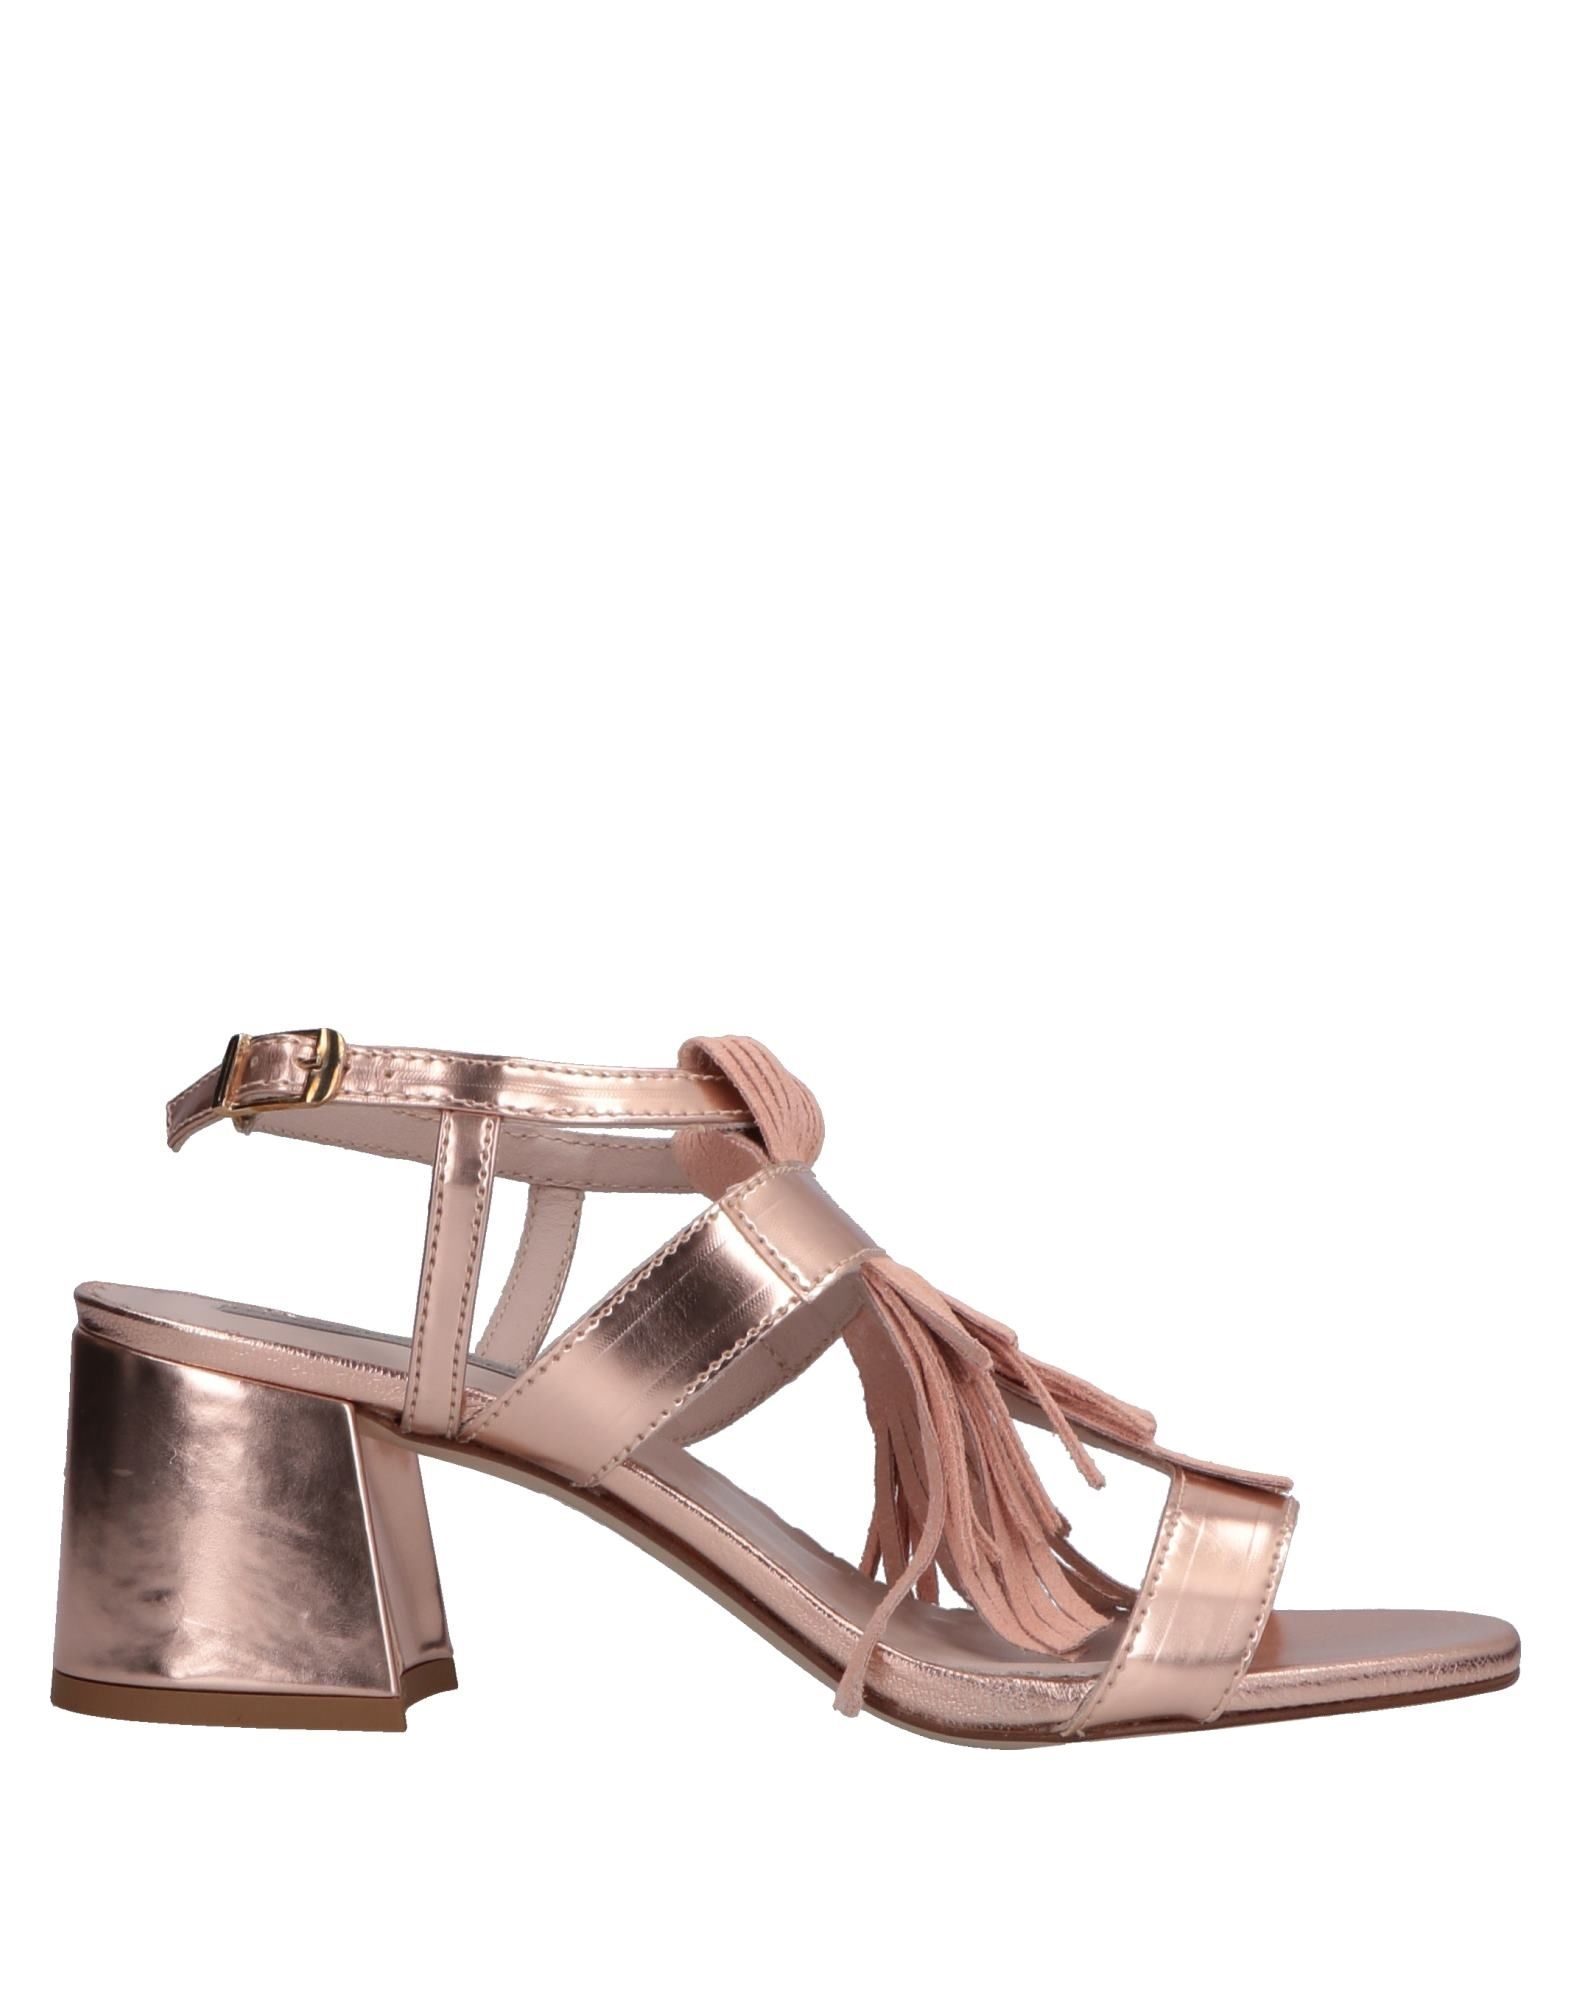 tosca blu chaussures sandales - femmes tosca tosca tosca blu chaussures sandales en ligne sur canada d20302